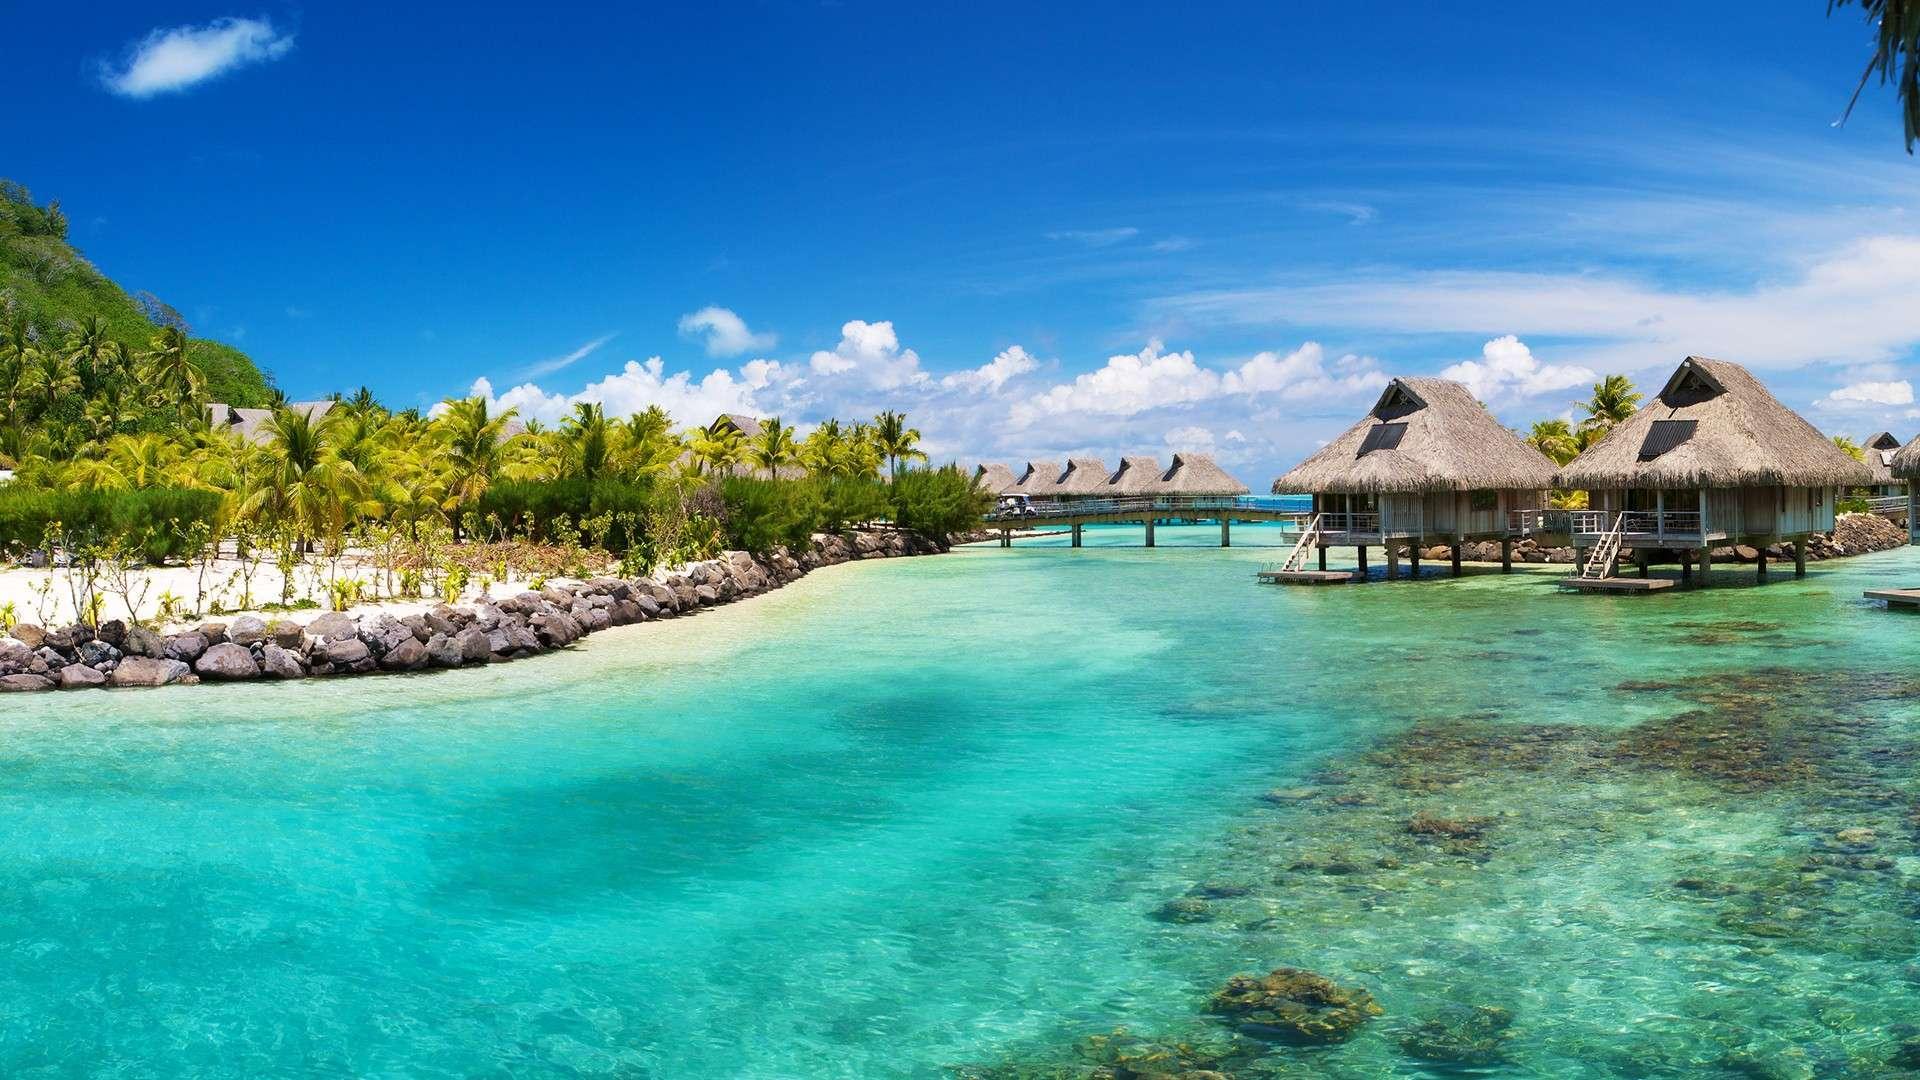 Tropical Islands HD Wallpaper FullHDWpp   Full HD 1920x1080